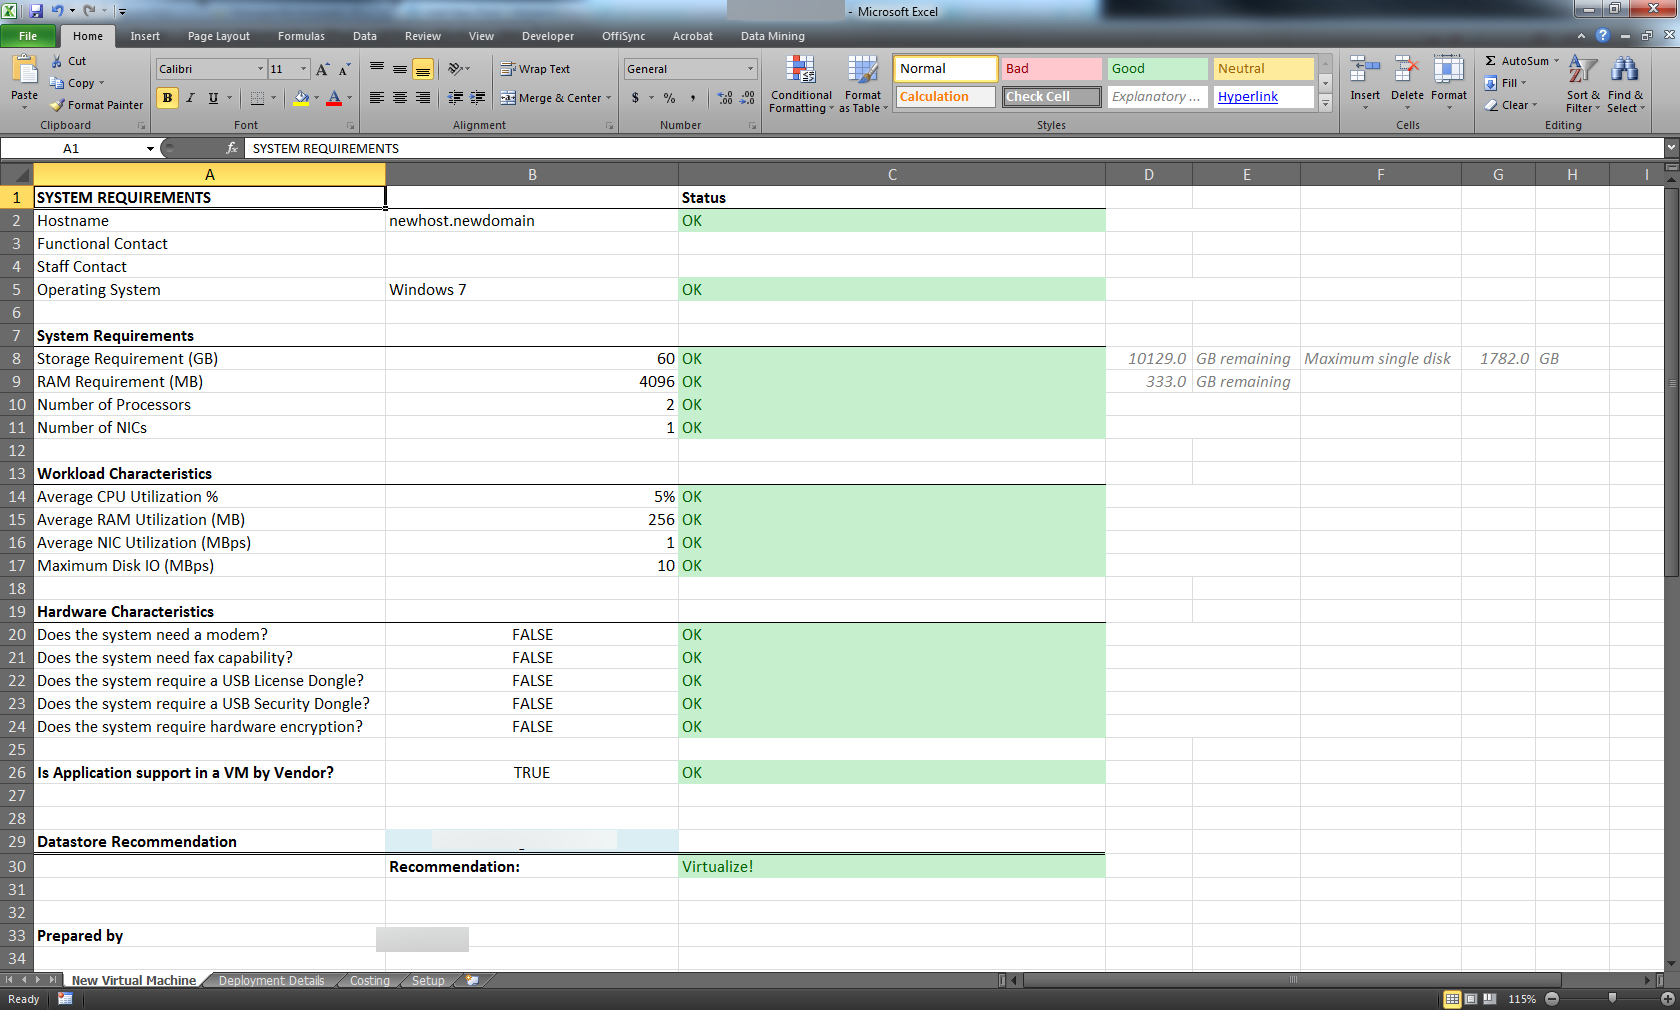 Vmware Capacity Planning Spreadsheet